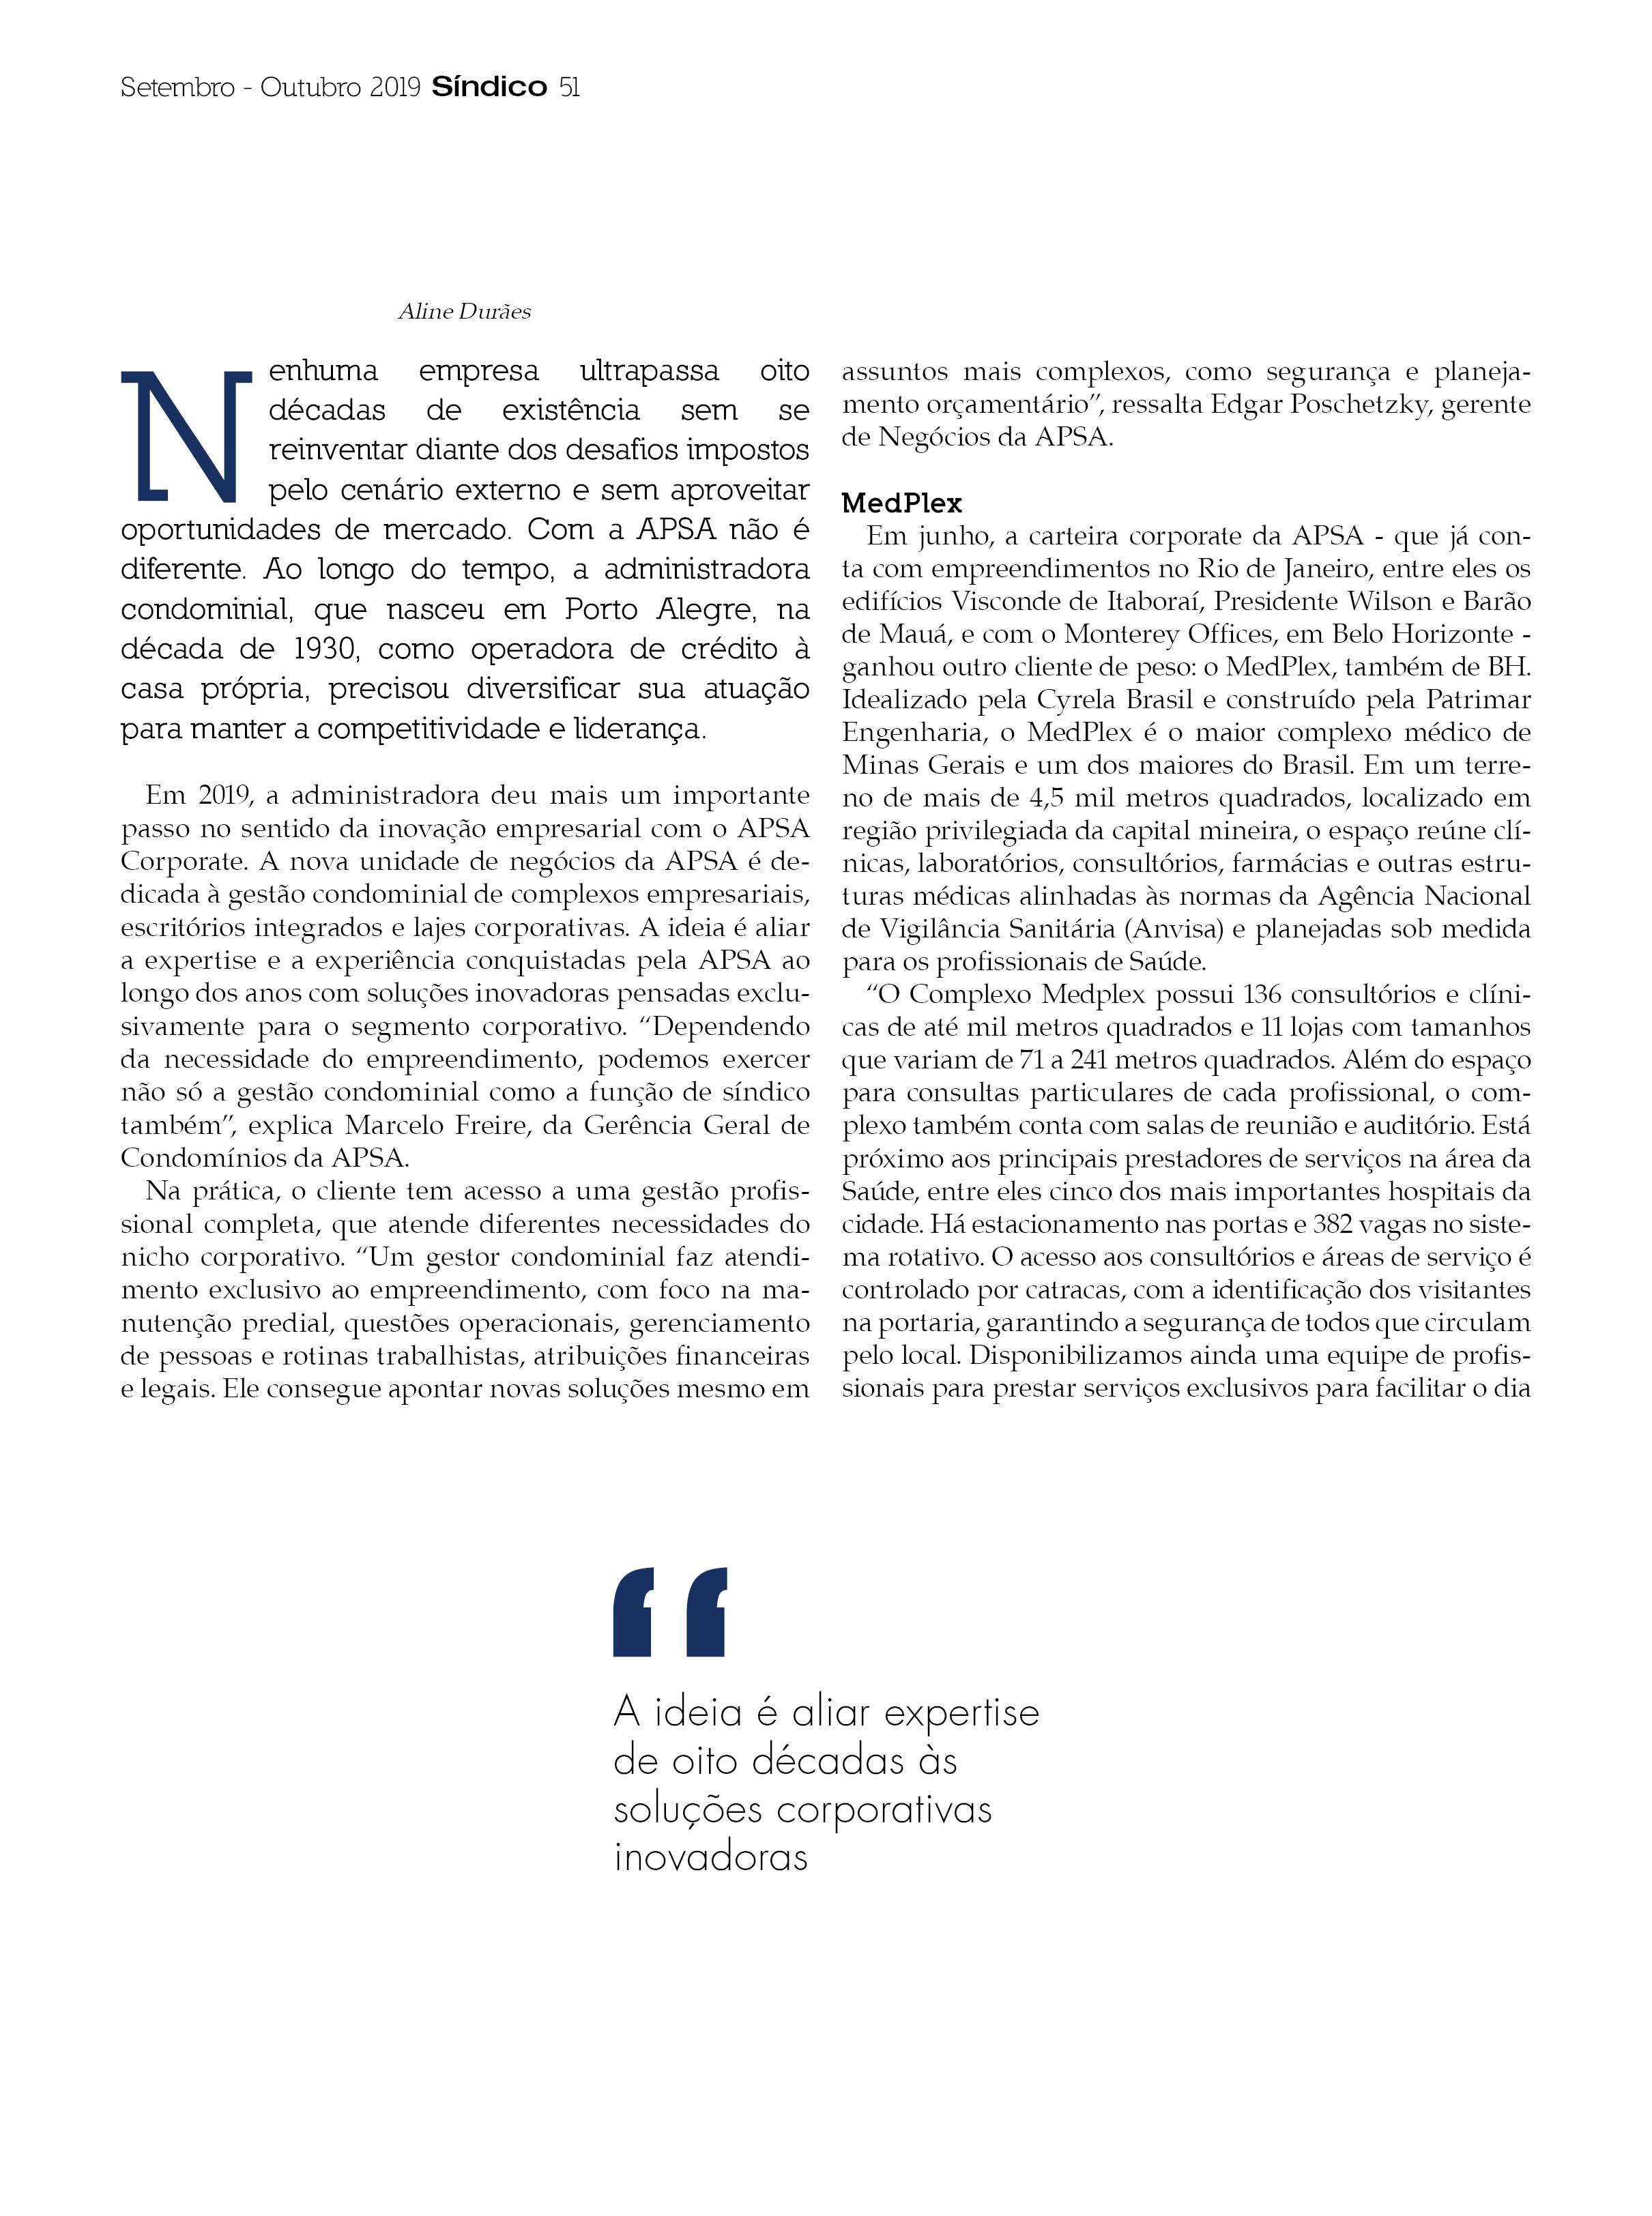 Revista Síndico_ed 246_49